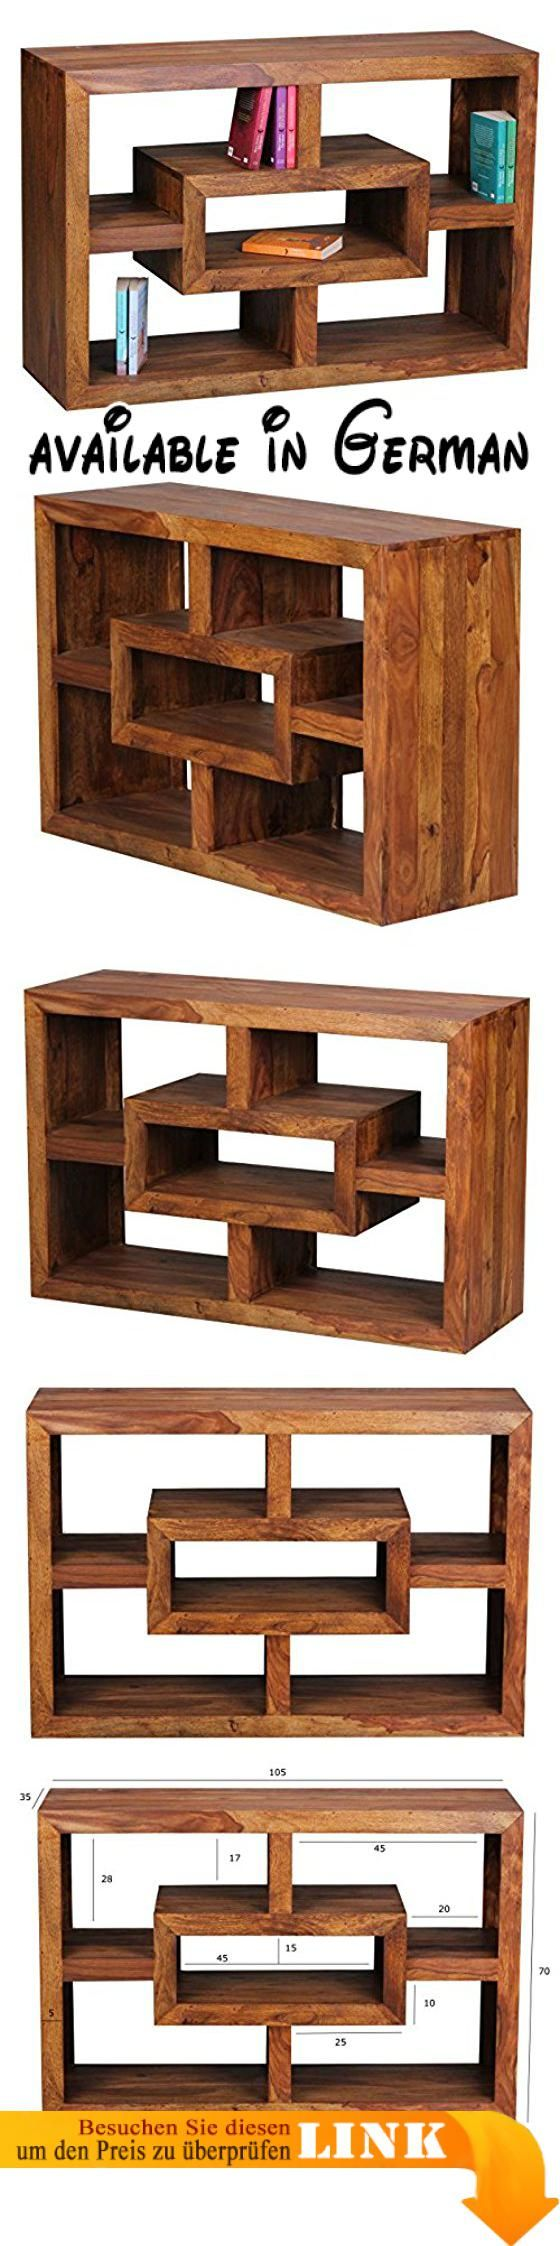 B00LCKU9F8 : WOHNLING Bücherregal Massiv-Holz Sheesham 105 x 70 cm ...